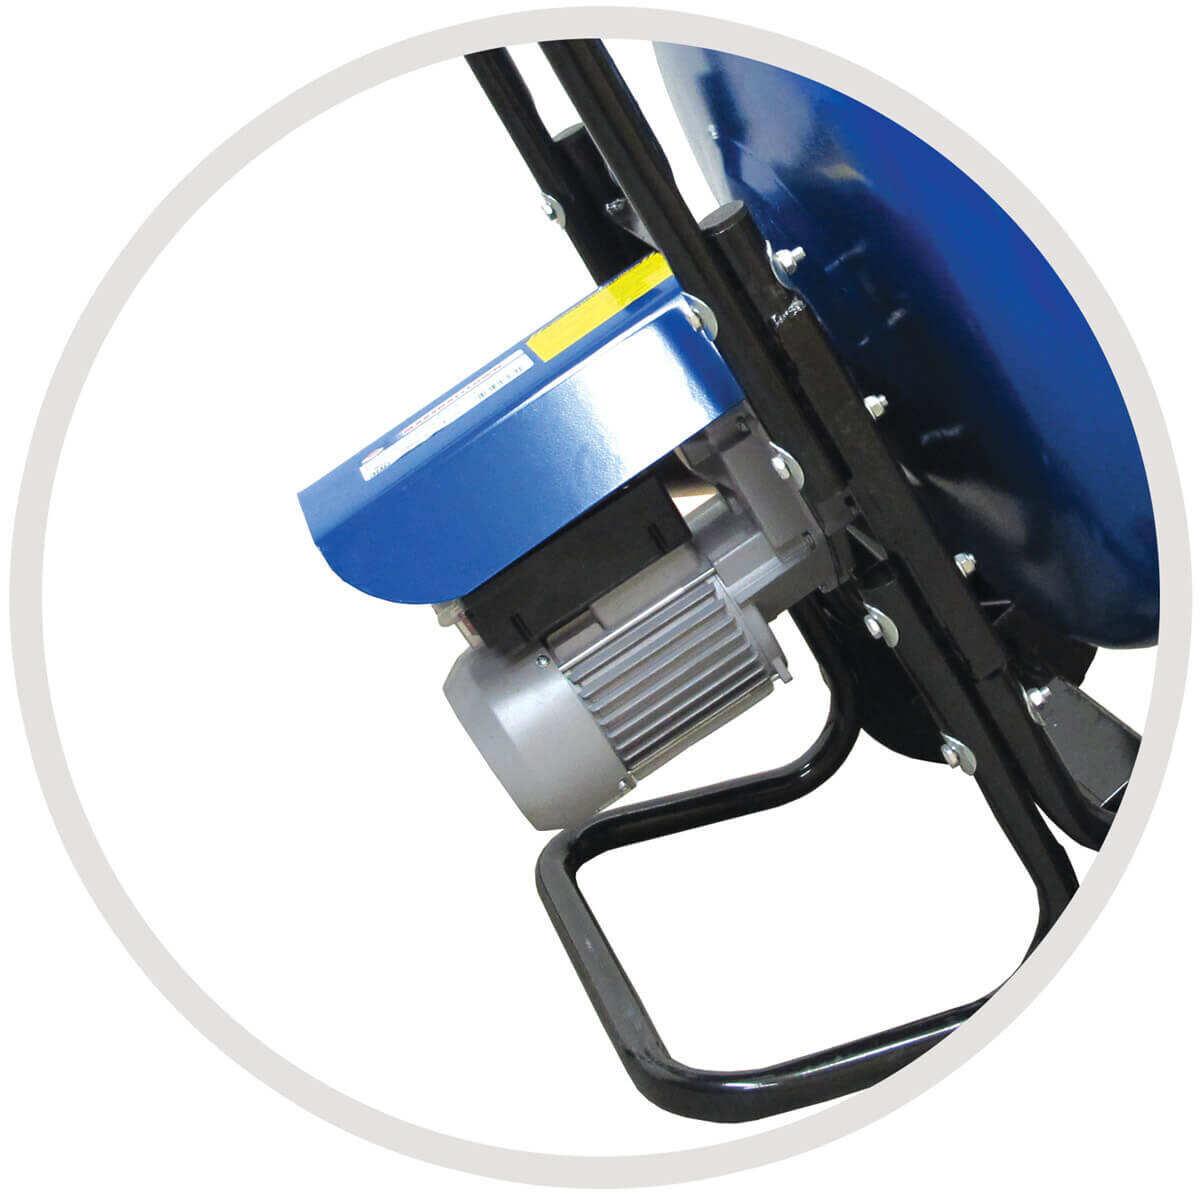 Marshalltown Portable Mixer Motor